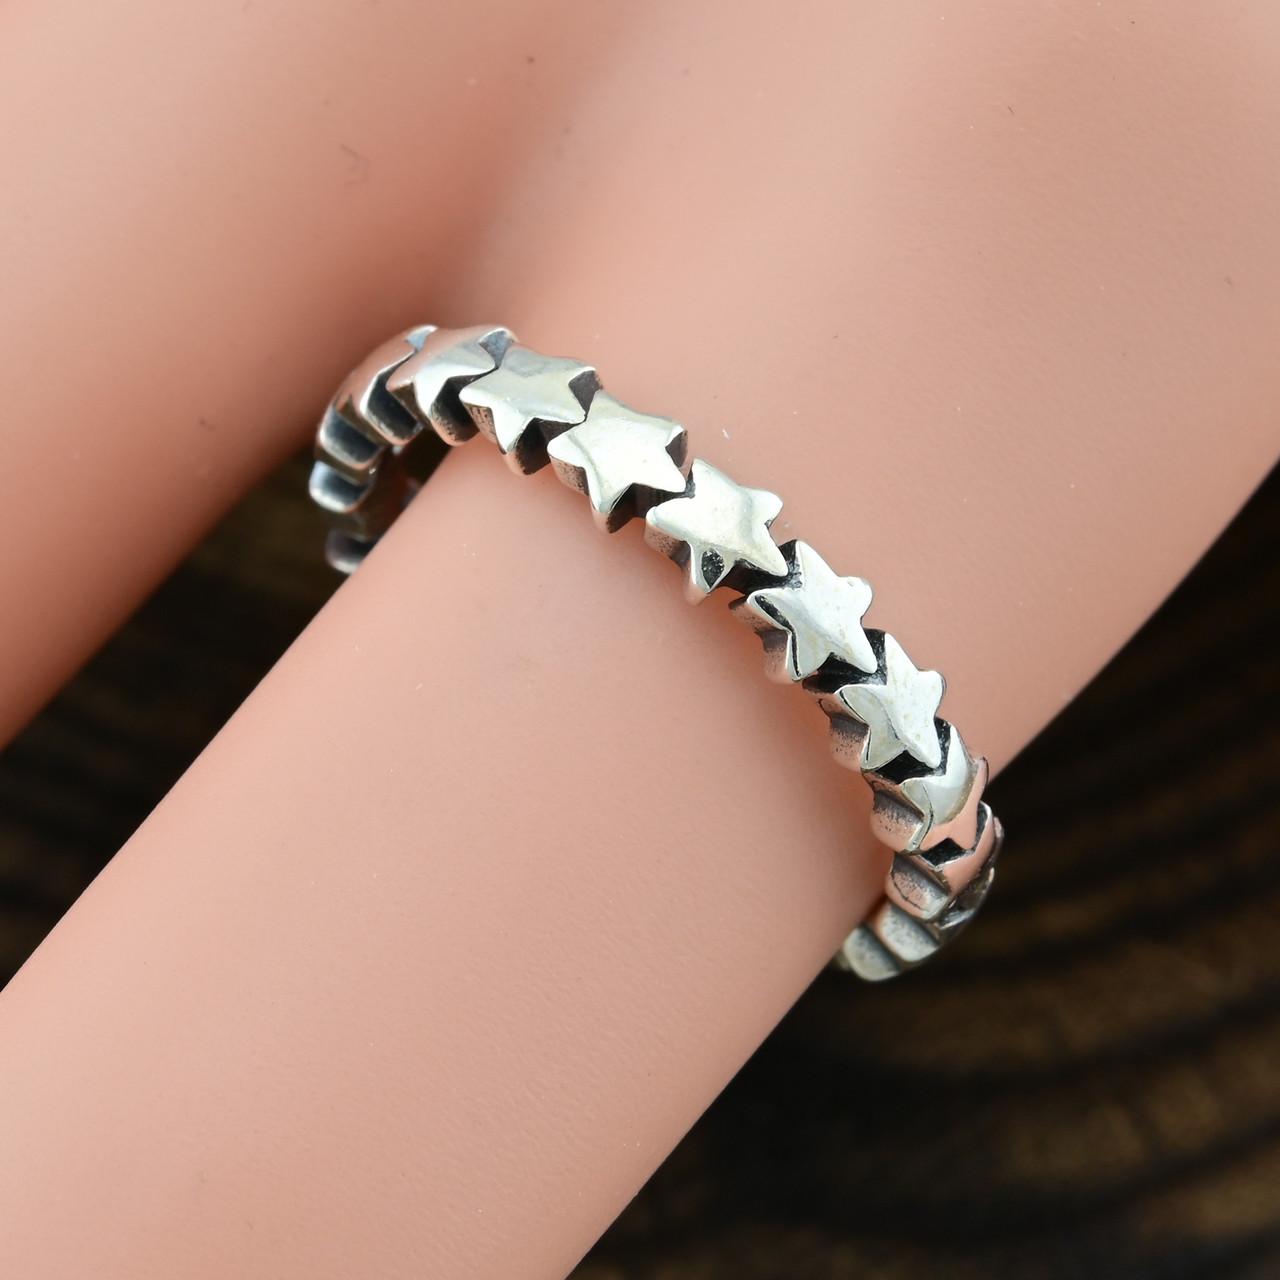 Серебряное кольцо ТС510298 вес 2.25 г размер 18.5